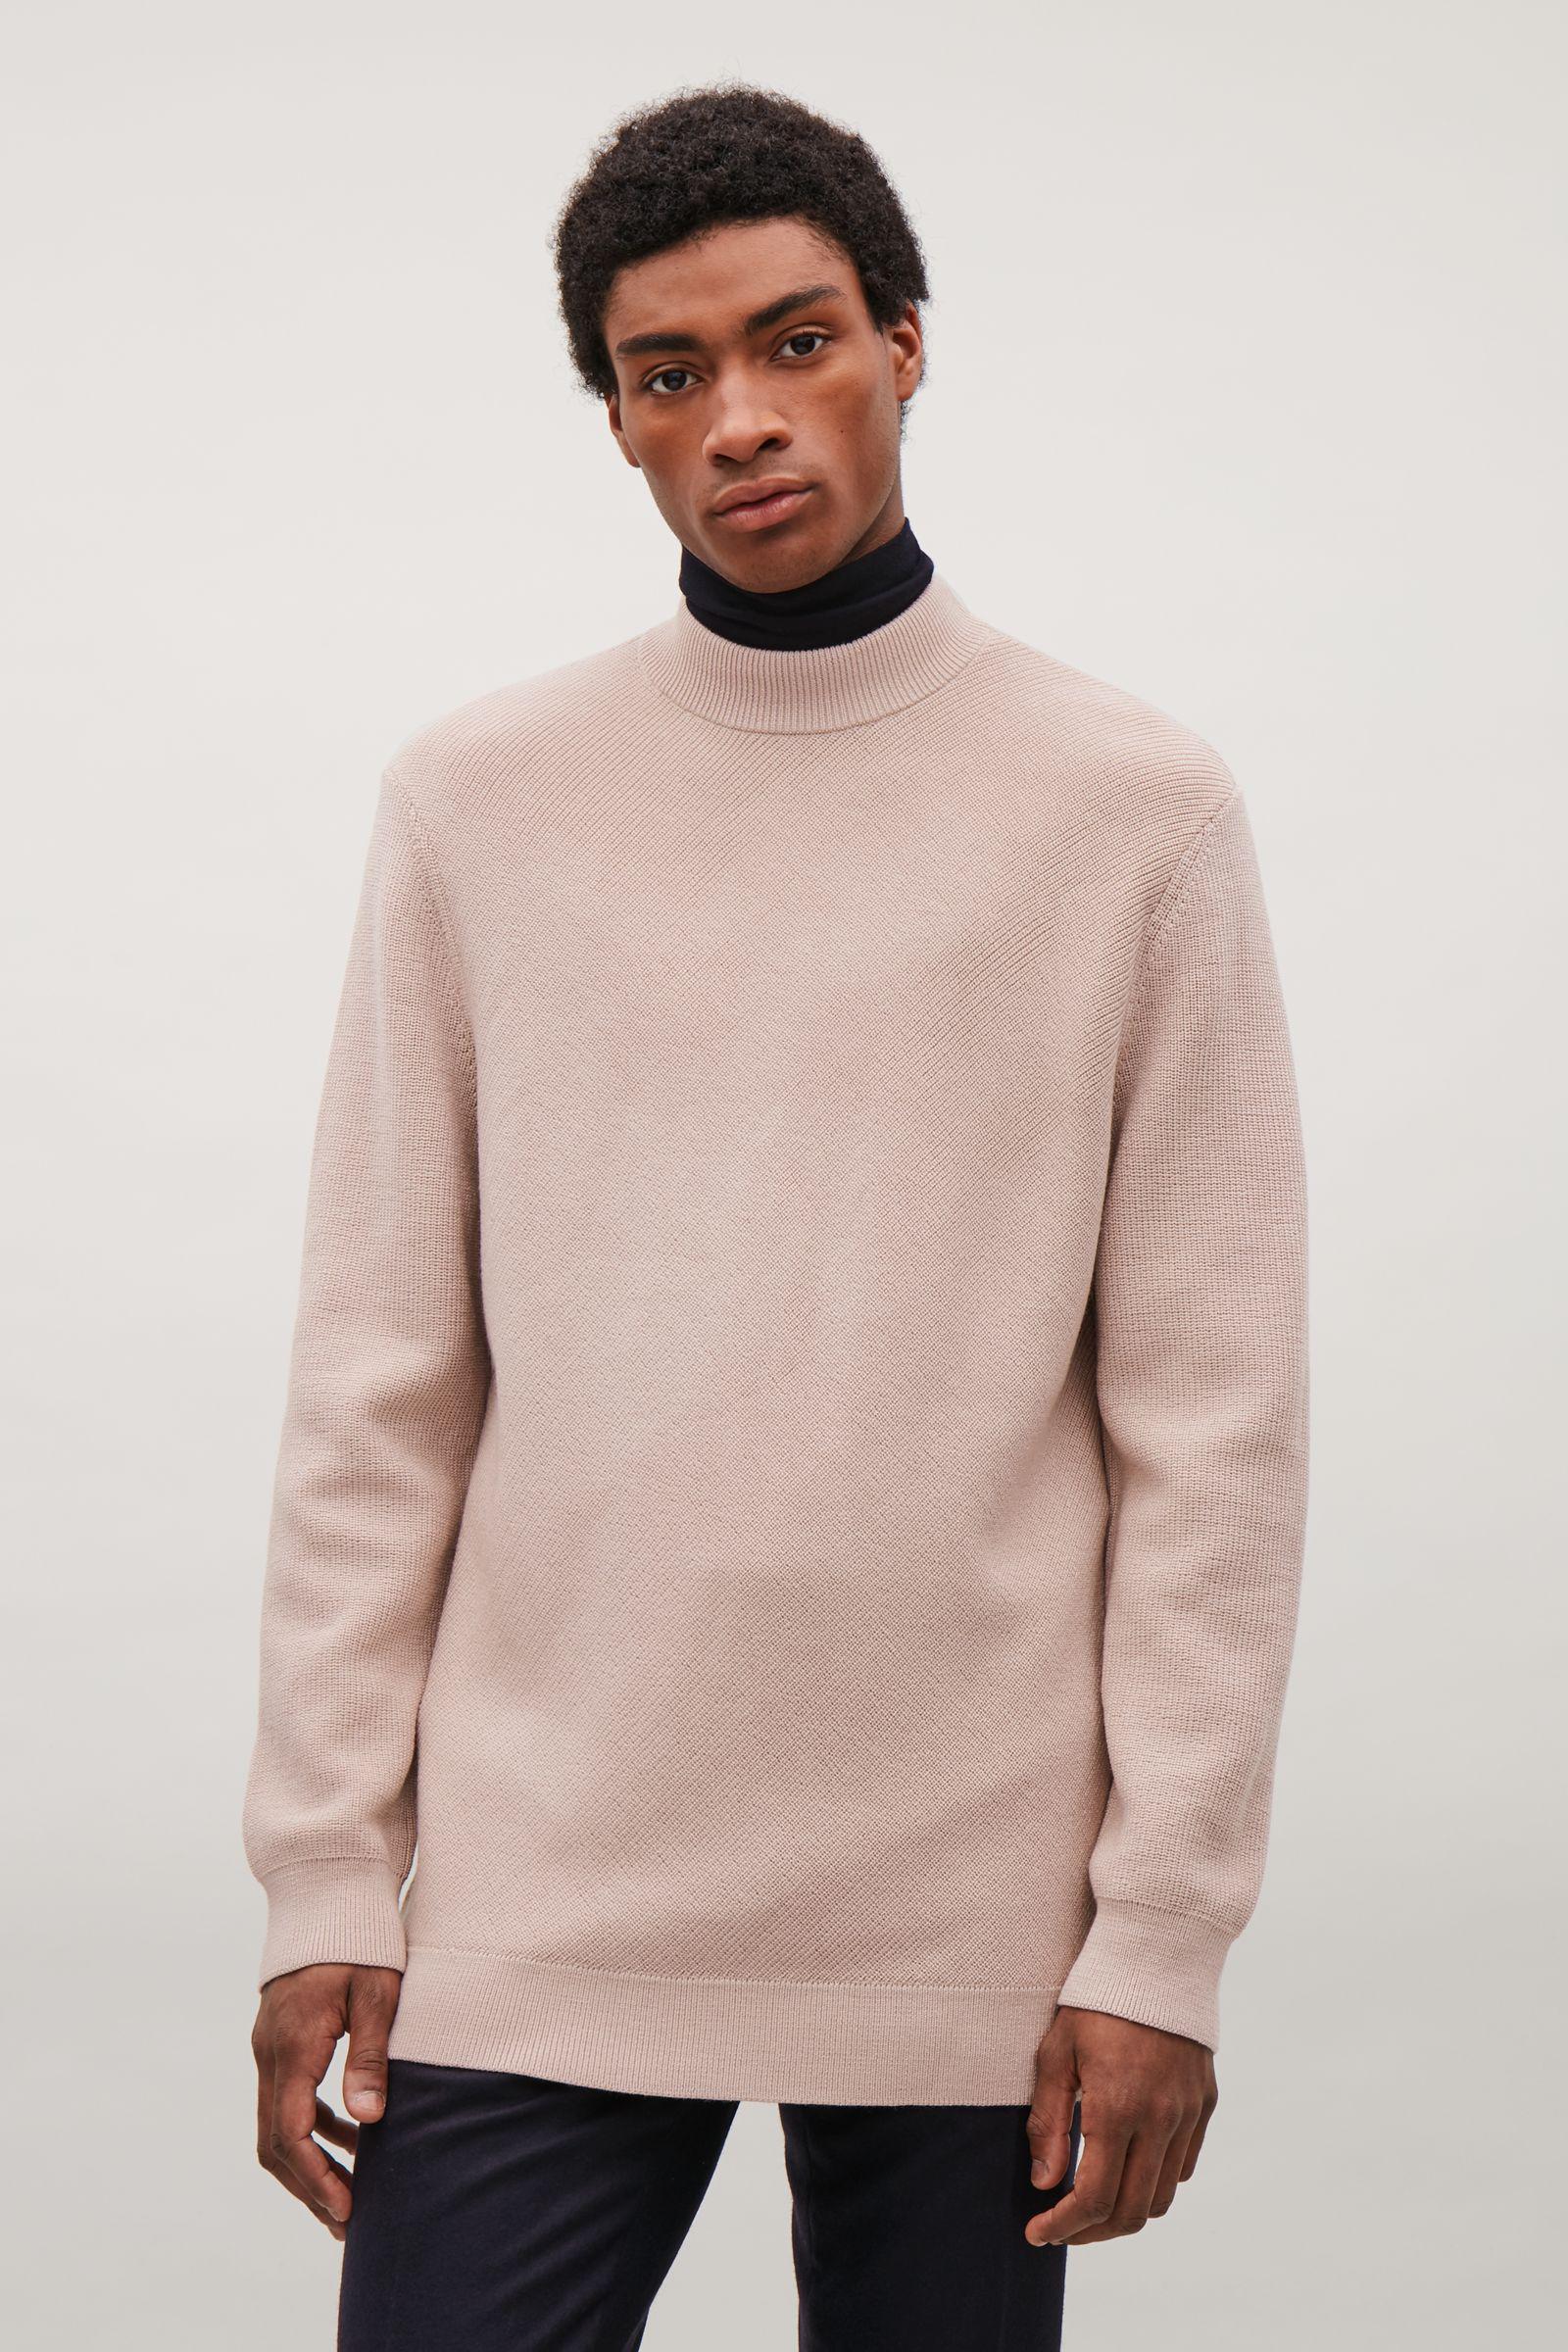 8473d824d3c4 COS Diagonal-stitch Wool Jumper in Pink for Men - Lyst